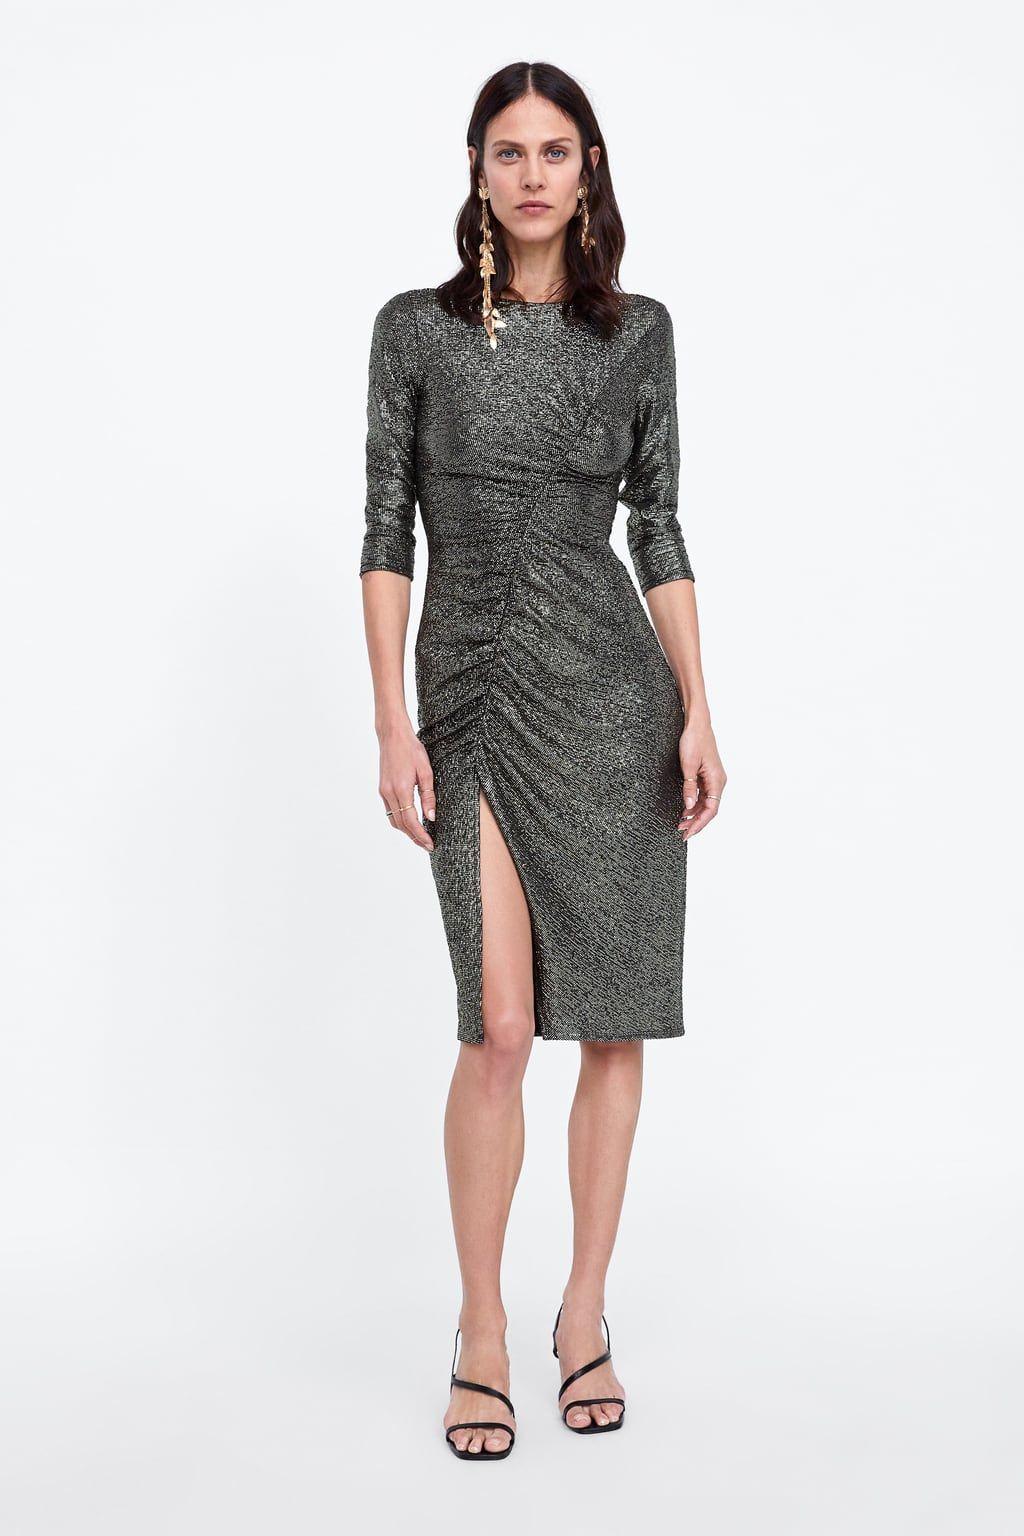 c9c260b1 Pin by findrili sophia on Stuff to Buy!!! | Dresses, Draped dress, Zara